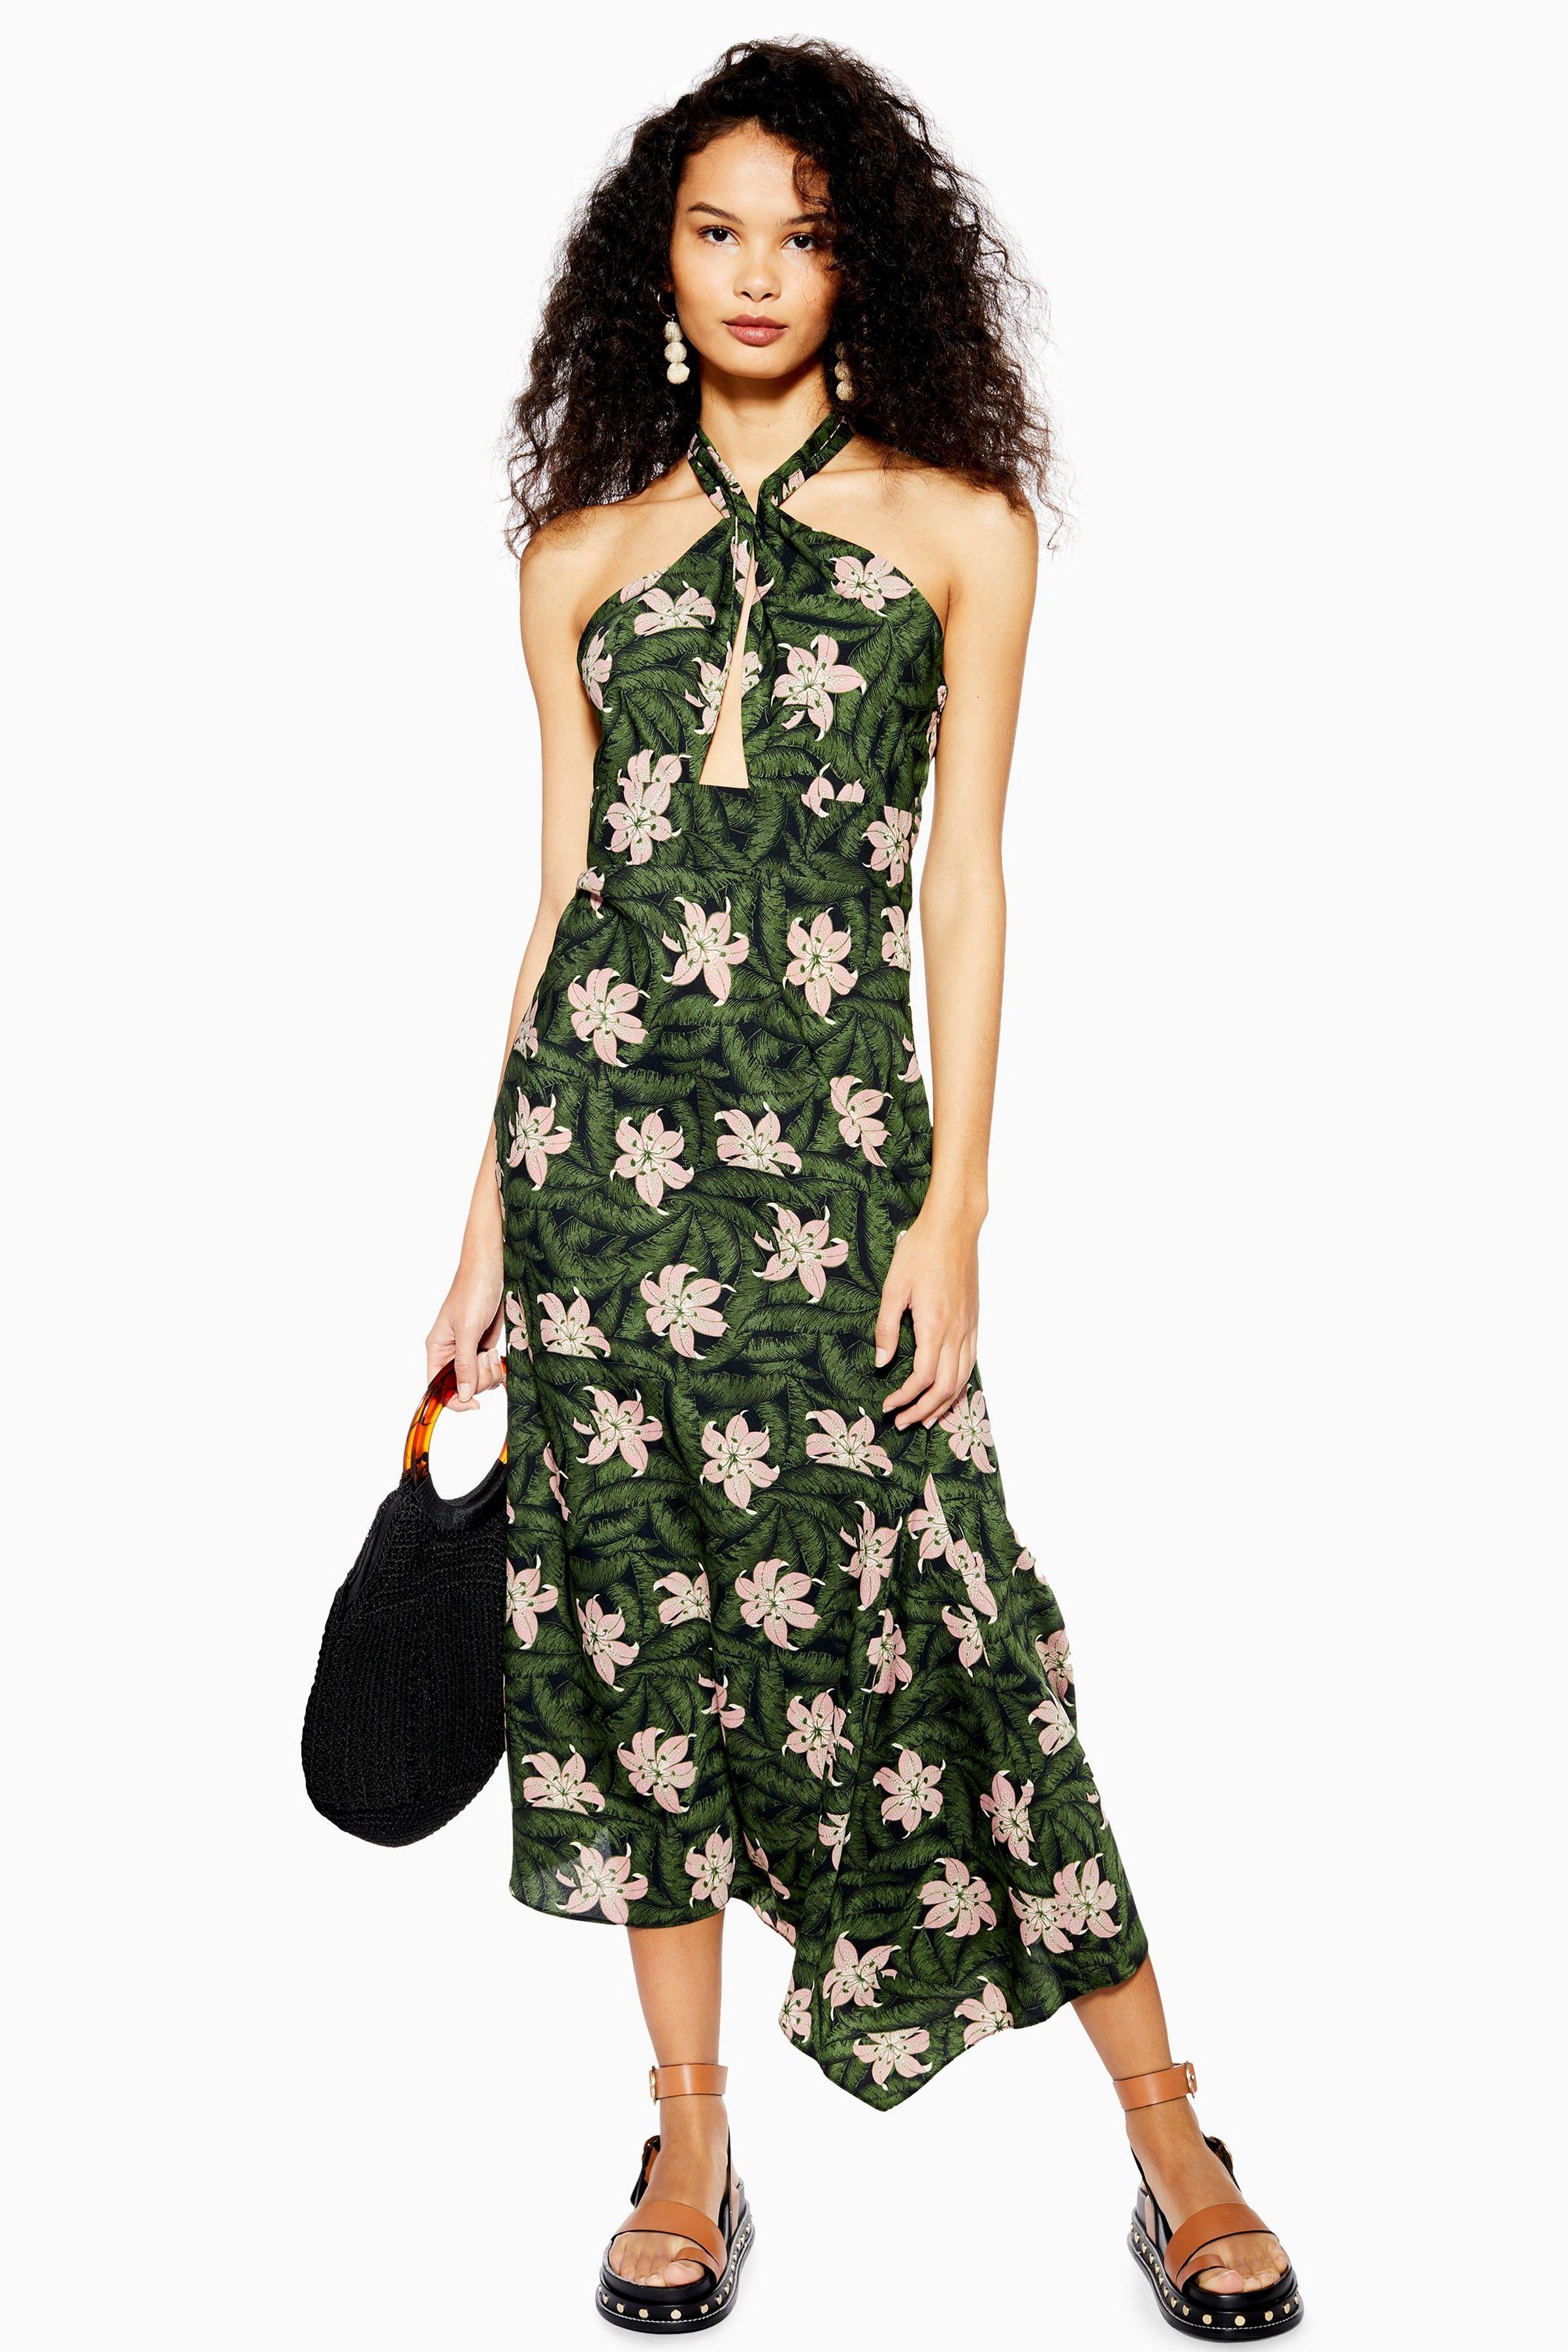 e0d6843a9b15 Hibiscus Floral Halter Neck Midi Dress in 2019 | #dresses | Dresses ...